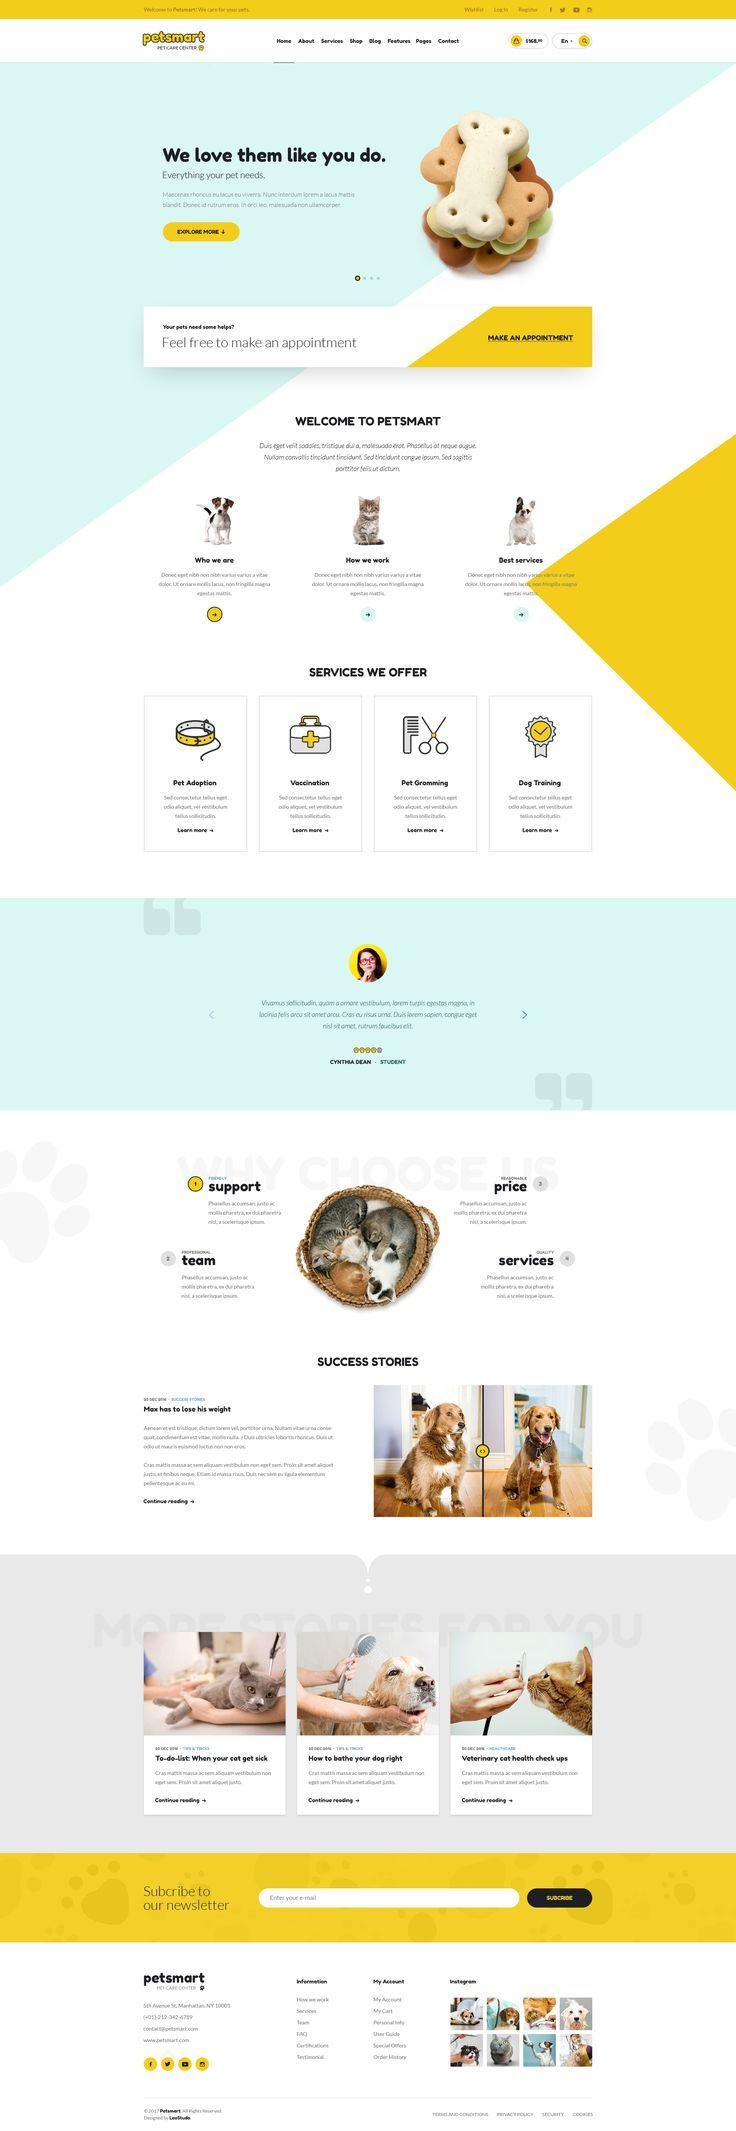 Pet Care, Shop & Hotel | Petsmart #petsmart #psd #psd template • Download ➝